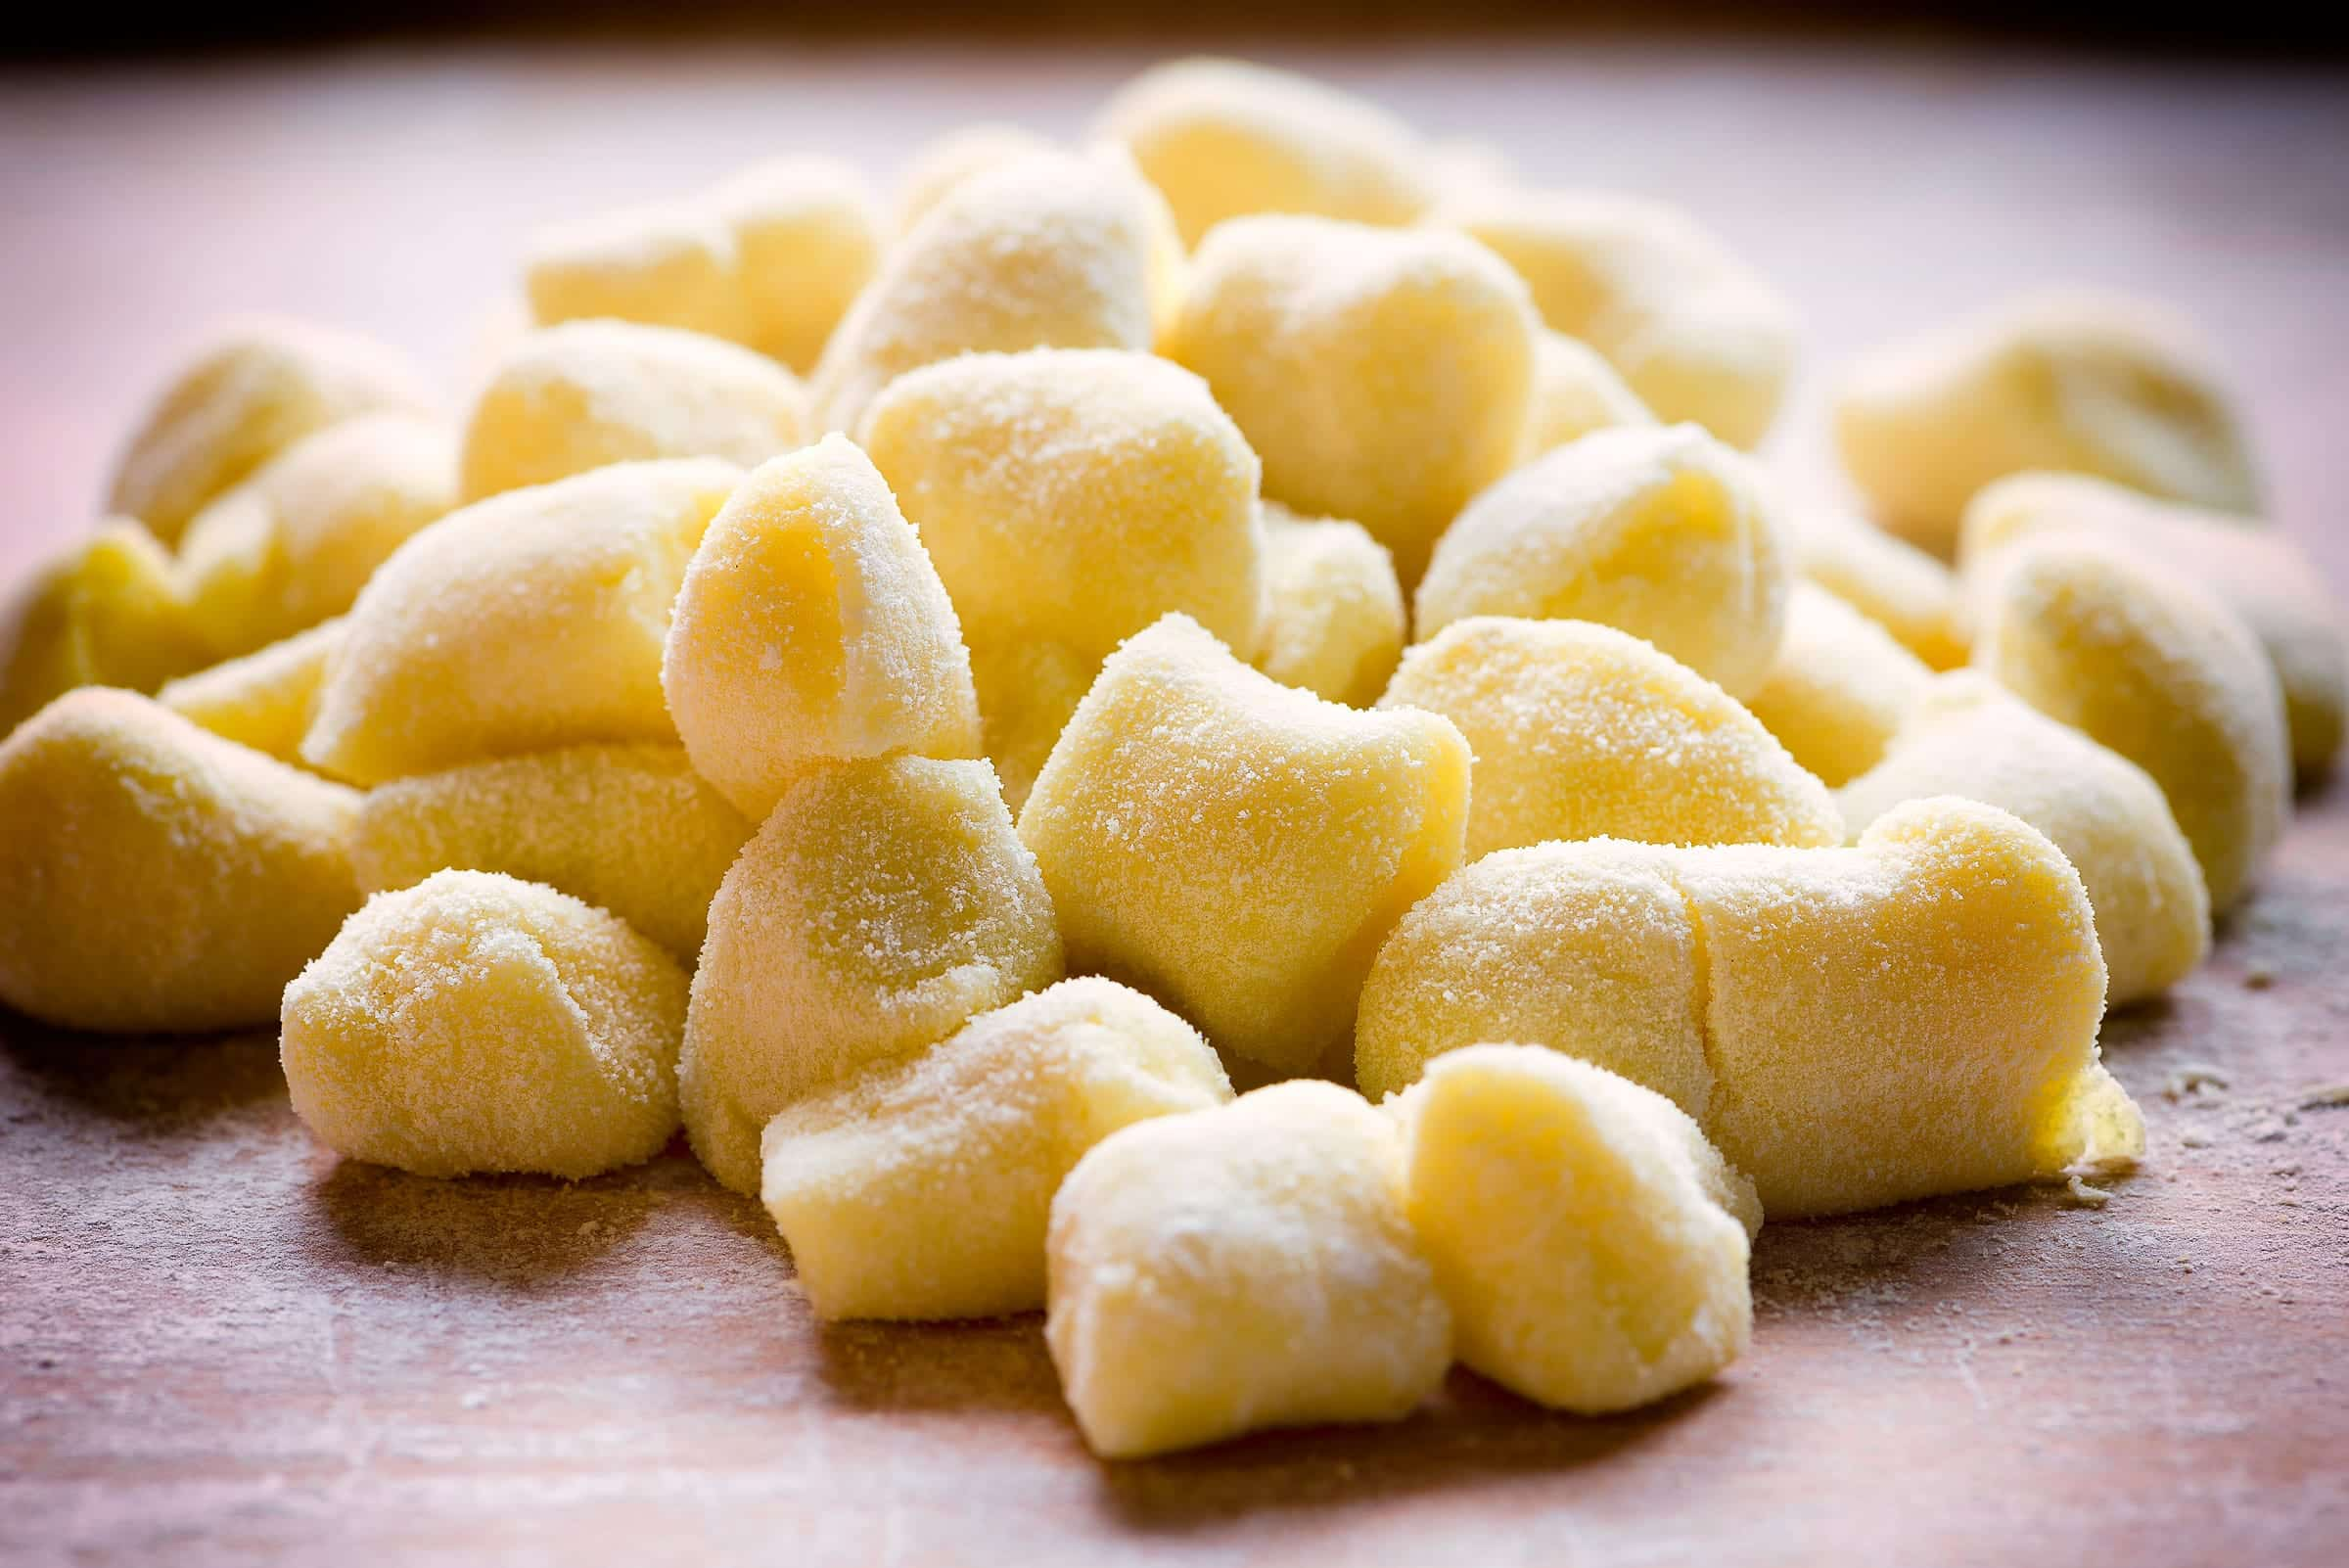 Gnocchi di patate ricetta gnamam.com